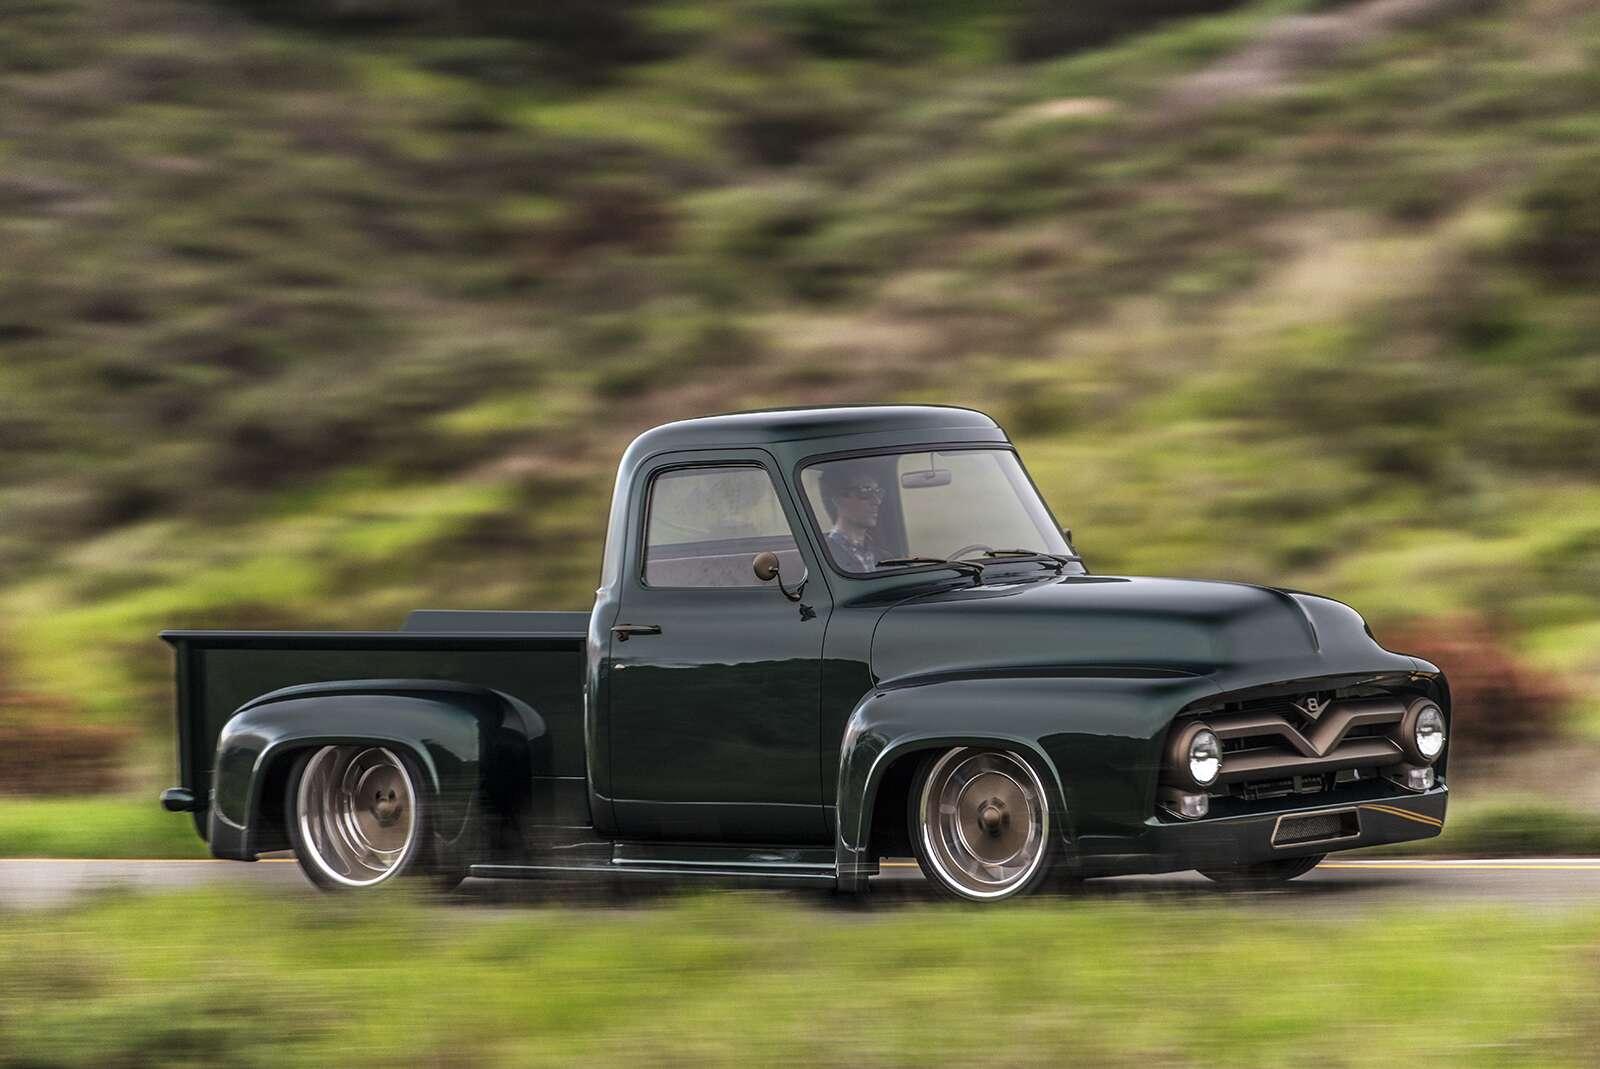 classic car studio 39 s 1953 ford f100 restomod review the fancy truck grandpa never had the drive. Black Bedroom Furniture Sets. Home Design Ideas